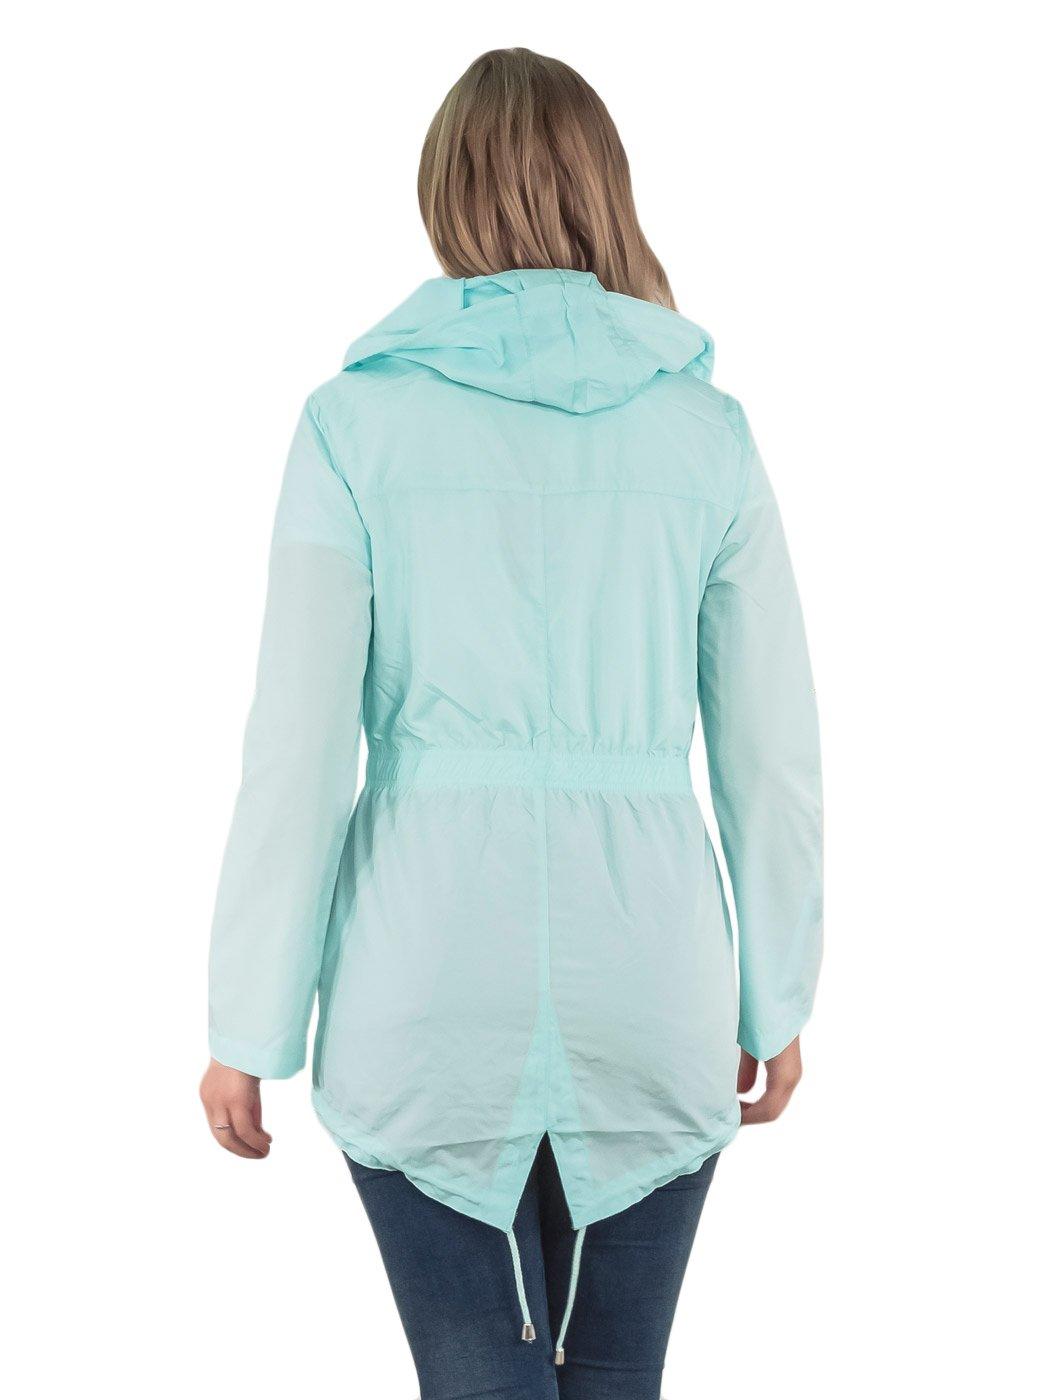 Womens-RainCoat-Plain-Hooded-Ladies-Jacket-Kagool-Parka-Long-Sleeves-Two-Pockets thumbnail 12